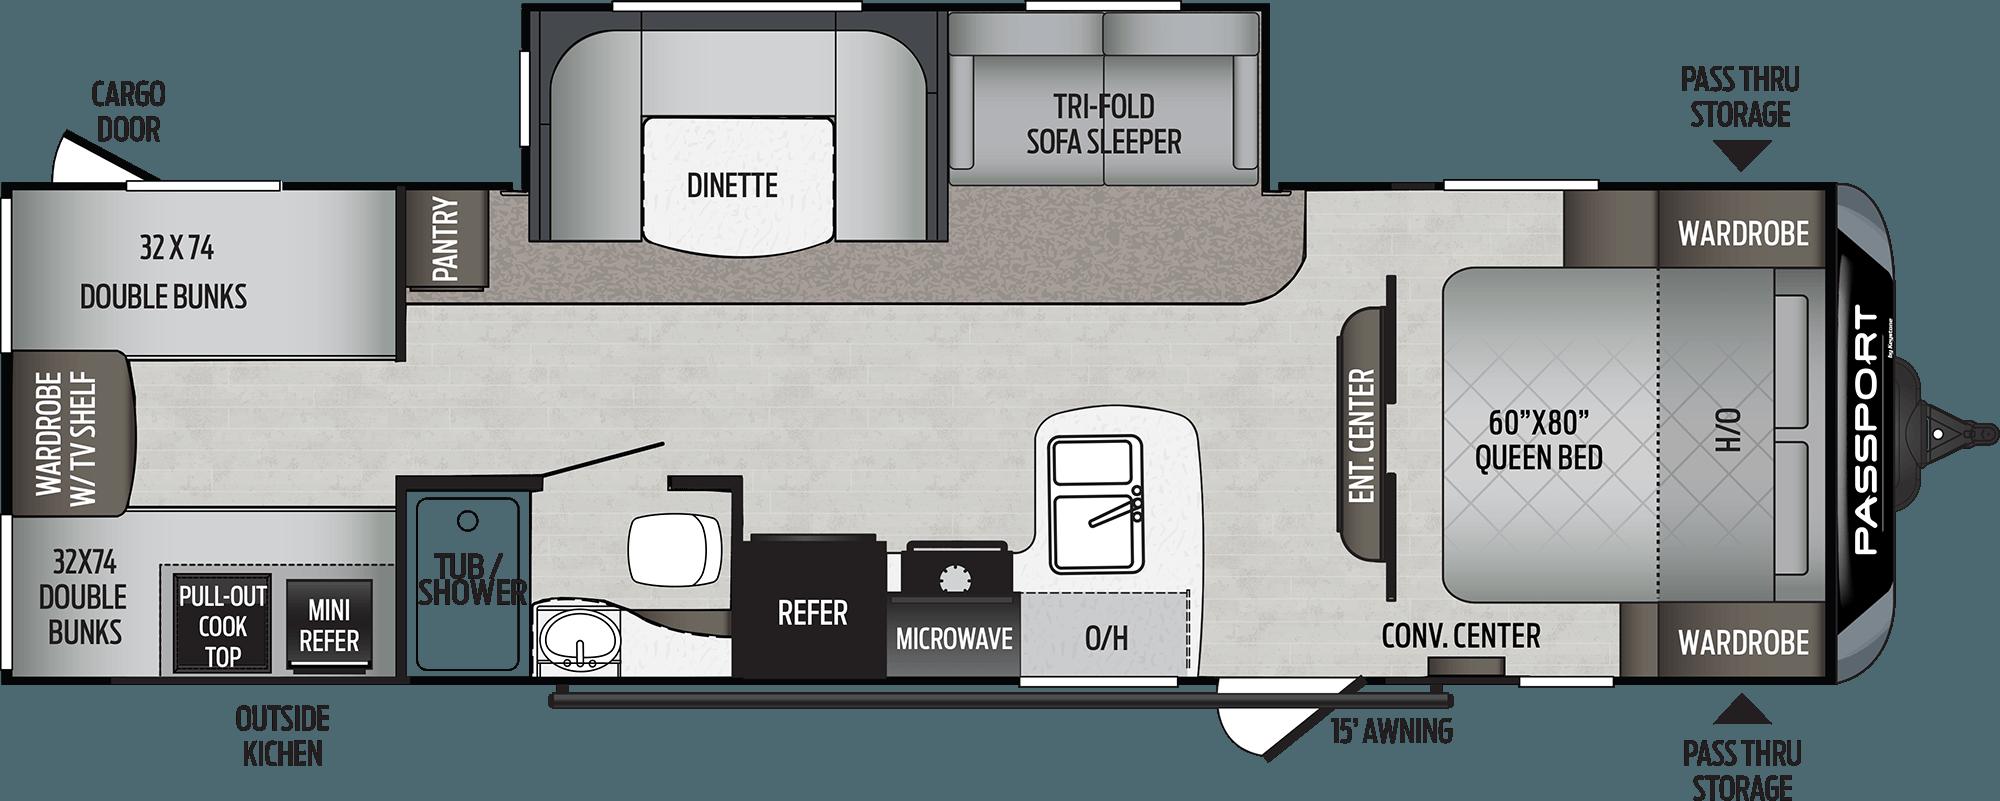 2020 KEYSTONE PASSPORT SL 292BH